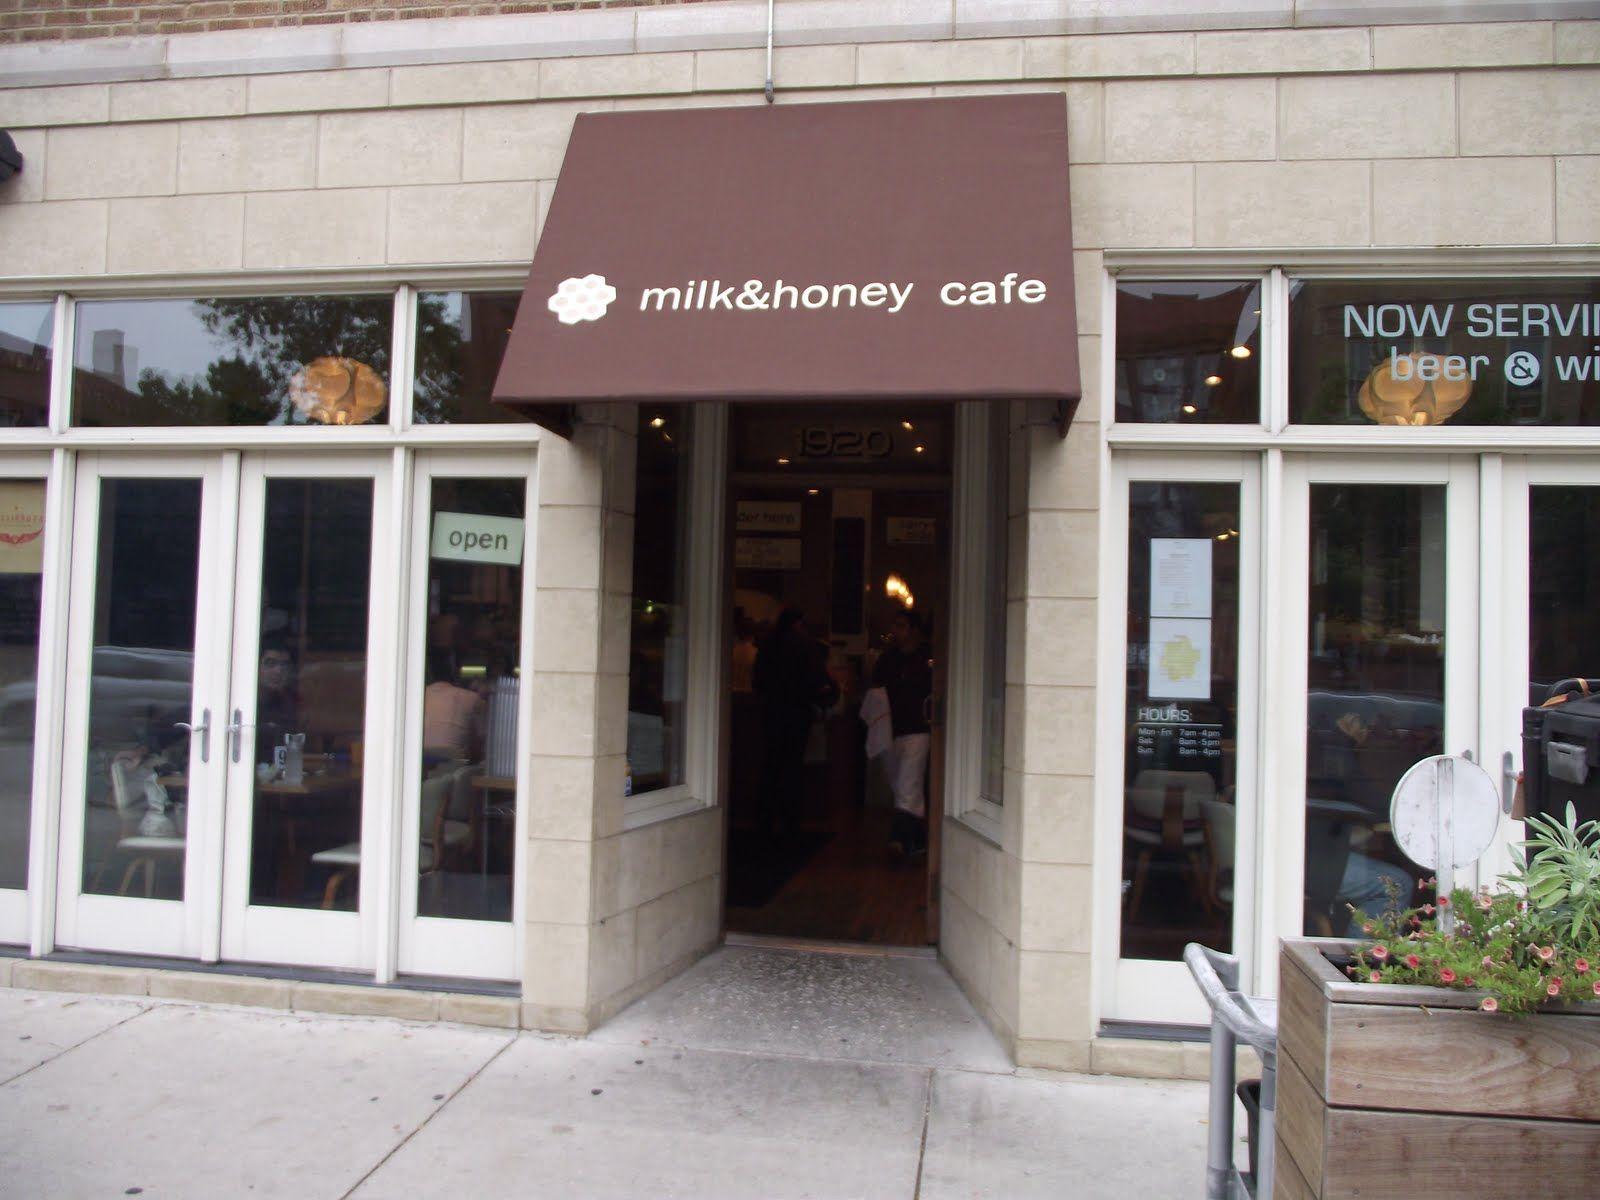 Milk & Honey Cafe   Honey cafe, Cafe, Milk and honey